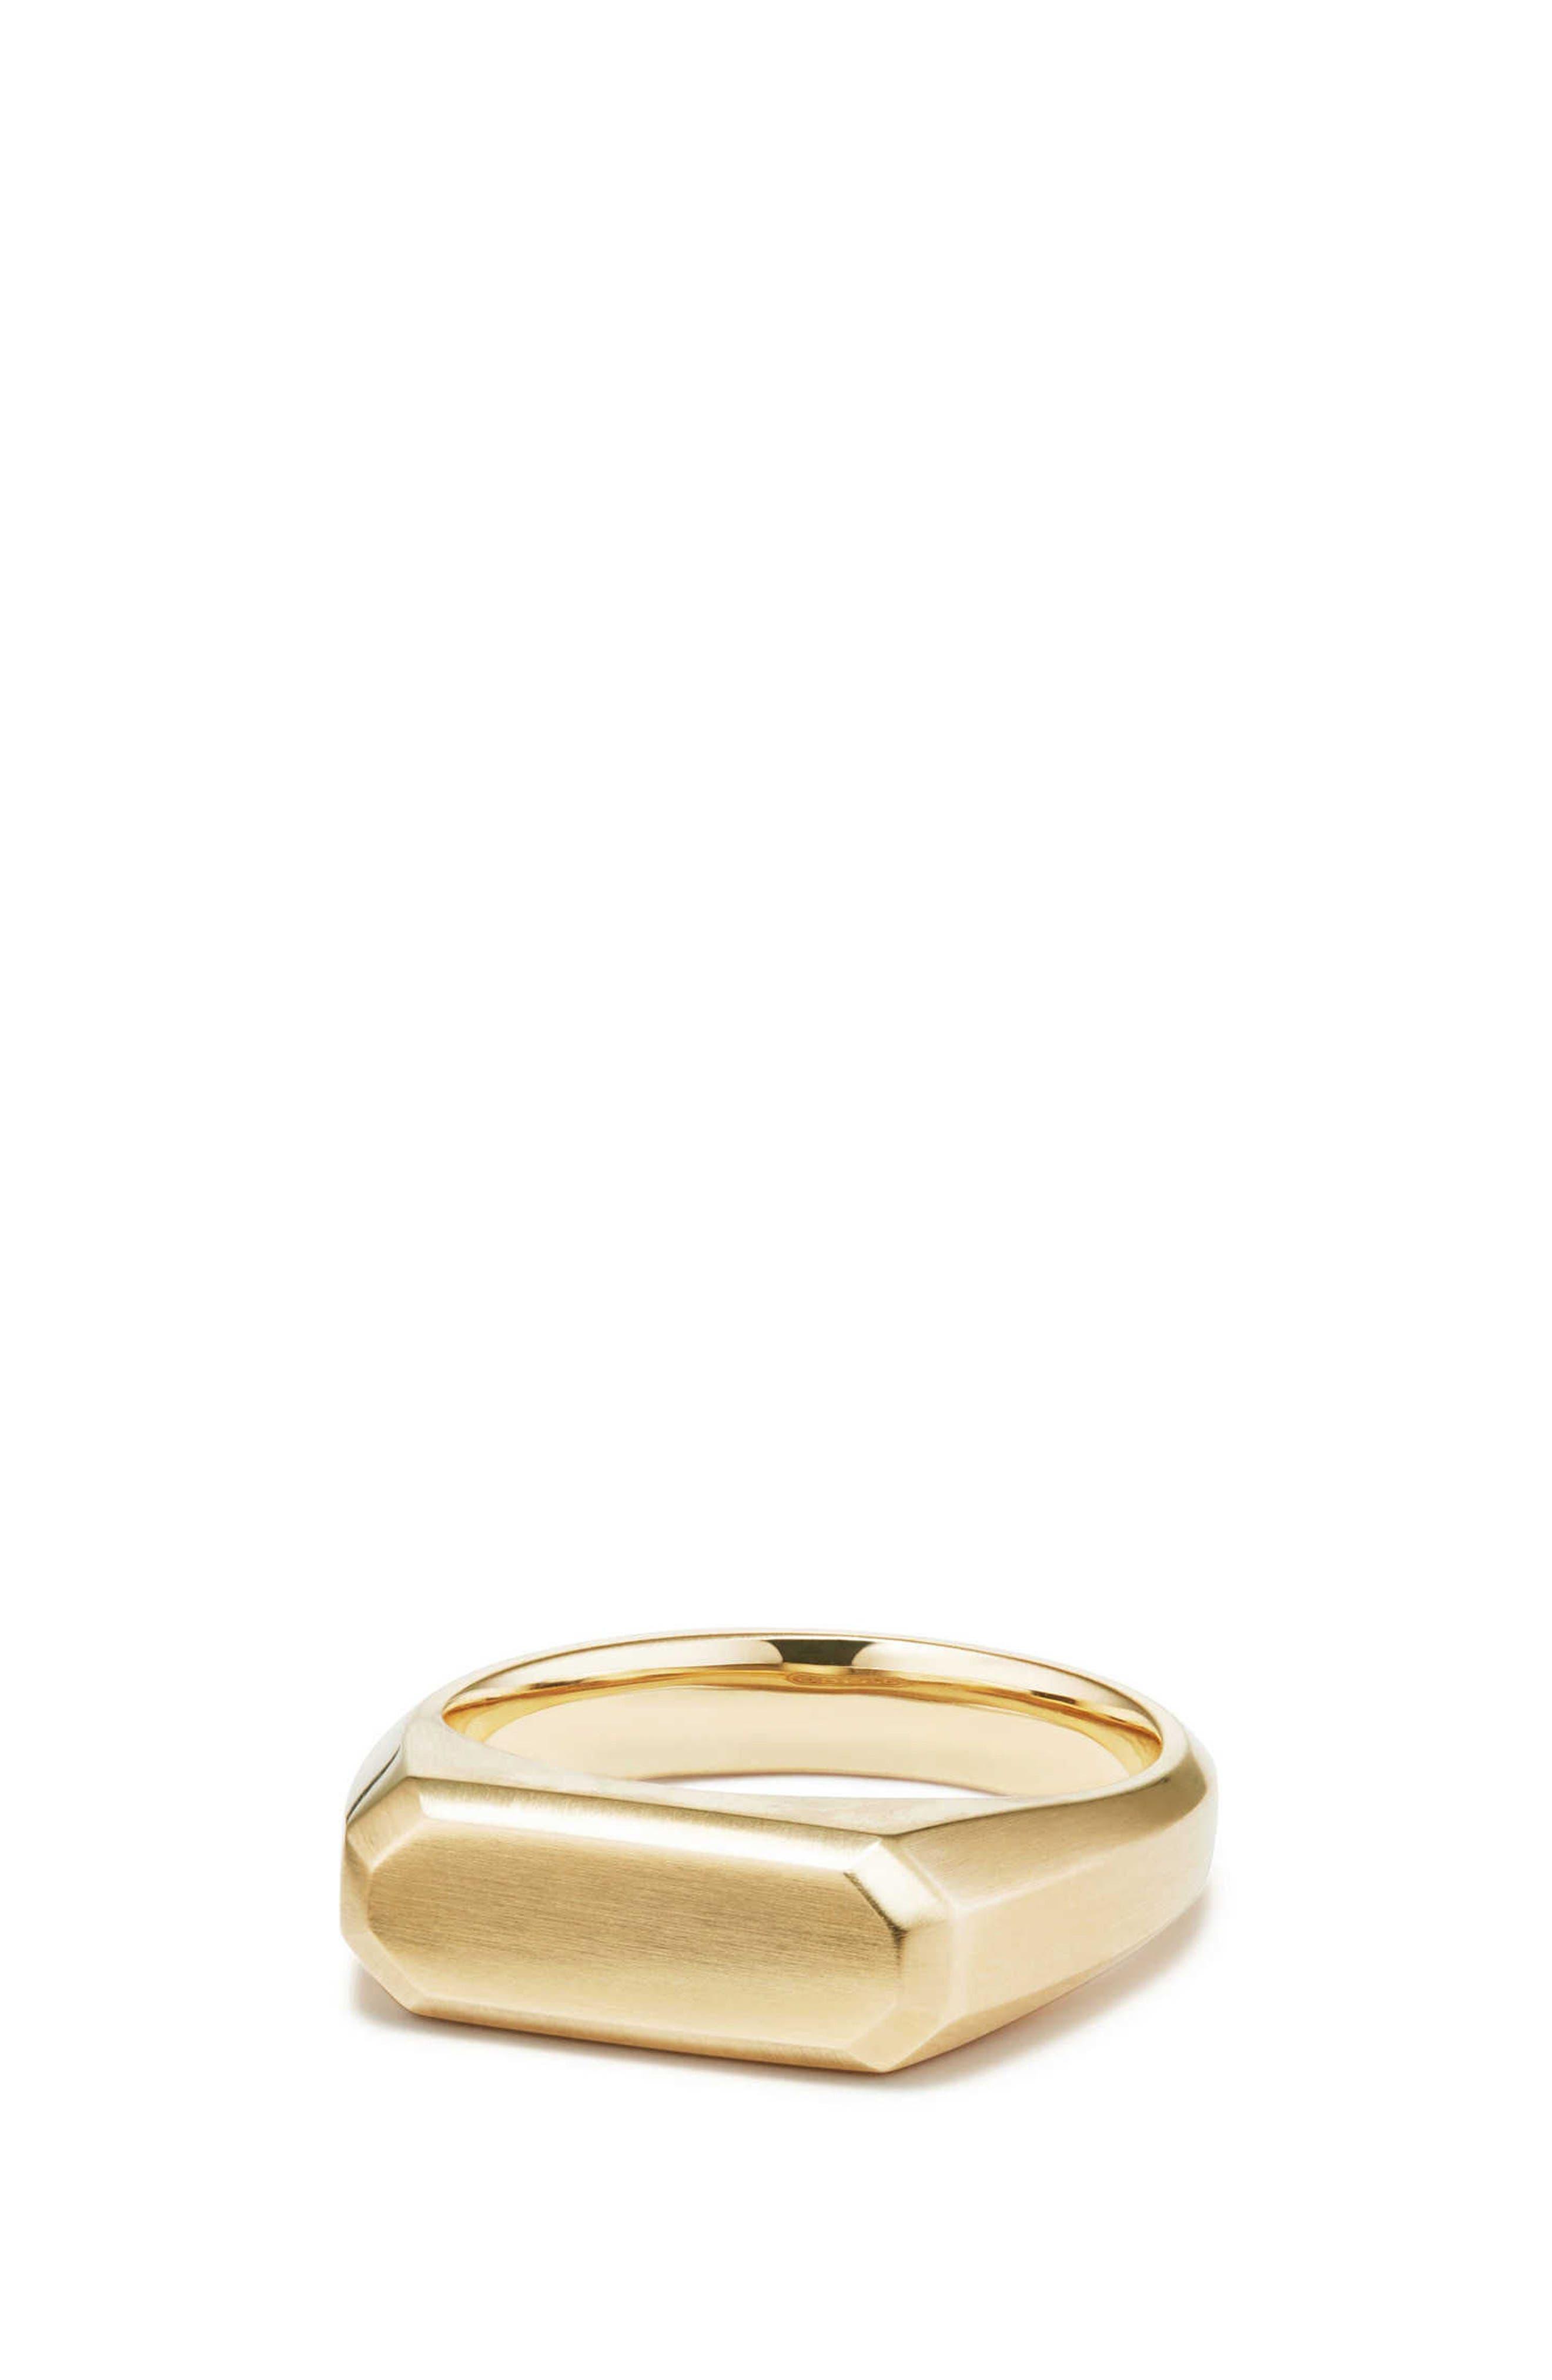 Streamline Signet Ring in 18K Gold,                             Main thumbnail 1, color,                             GOLD